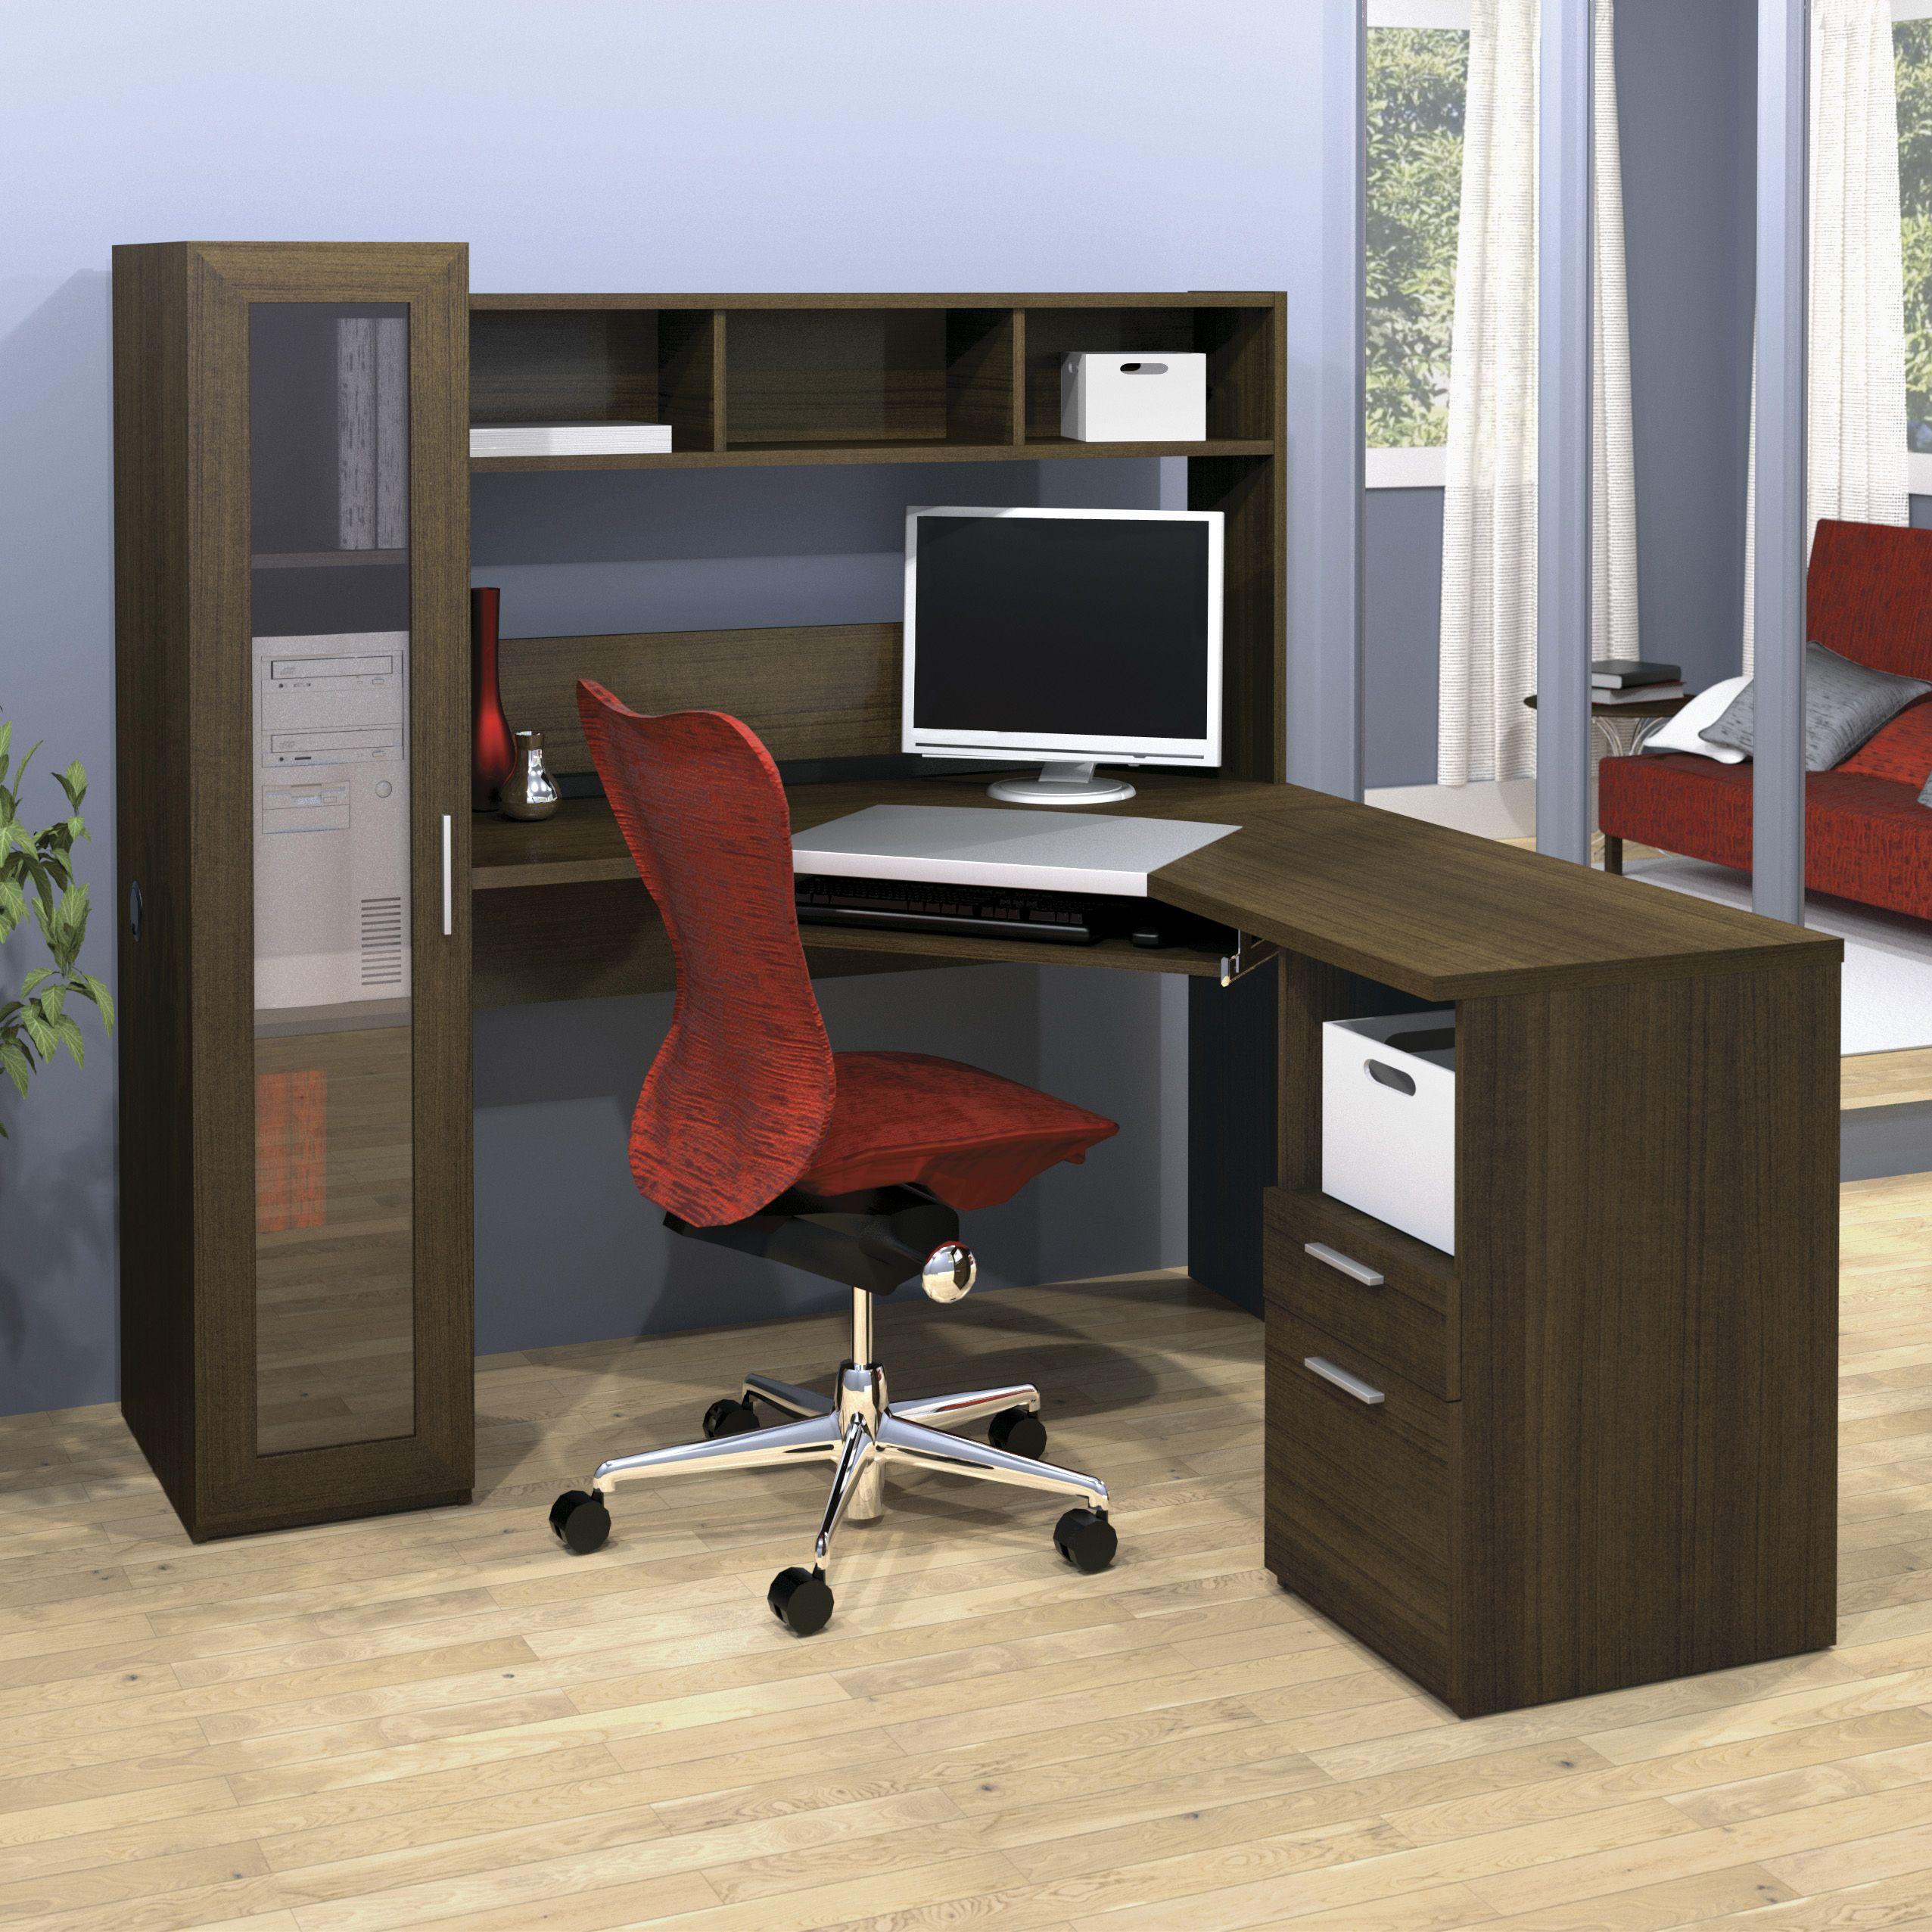 Corner Computer Desk with Storage Western Living Room